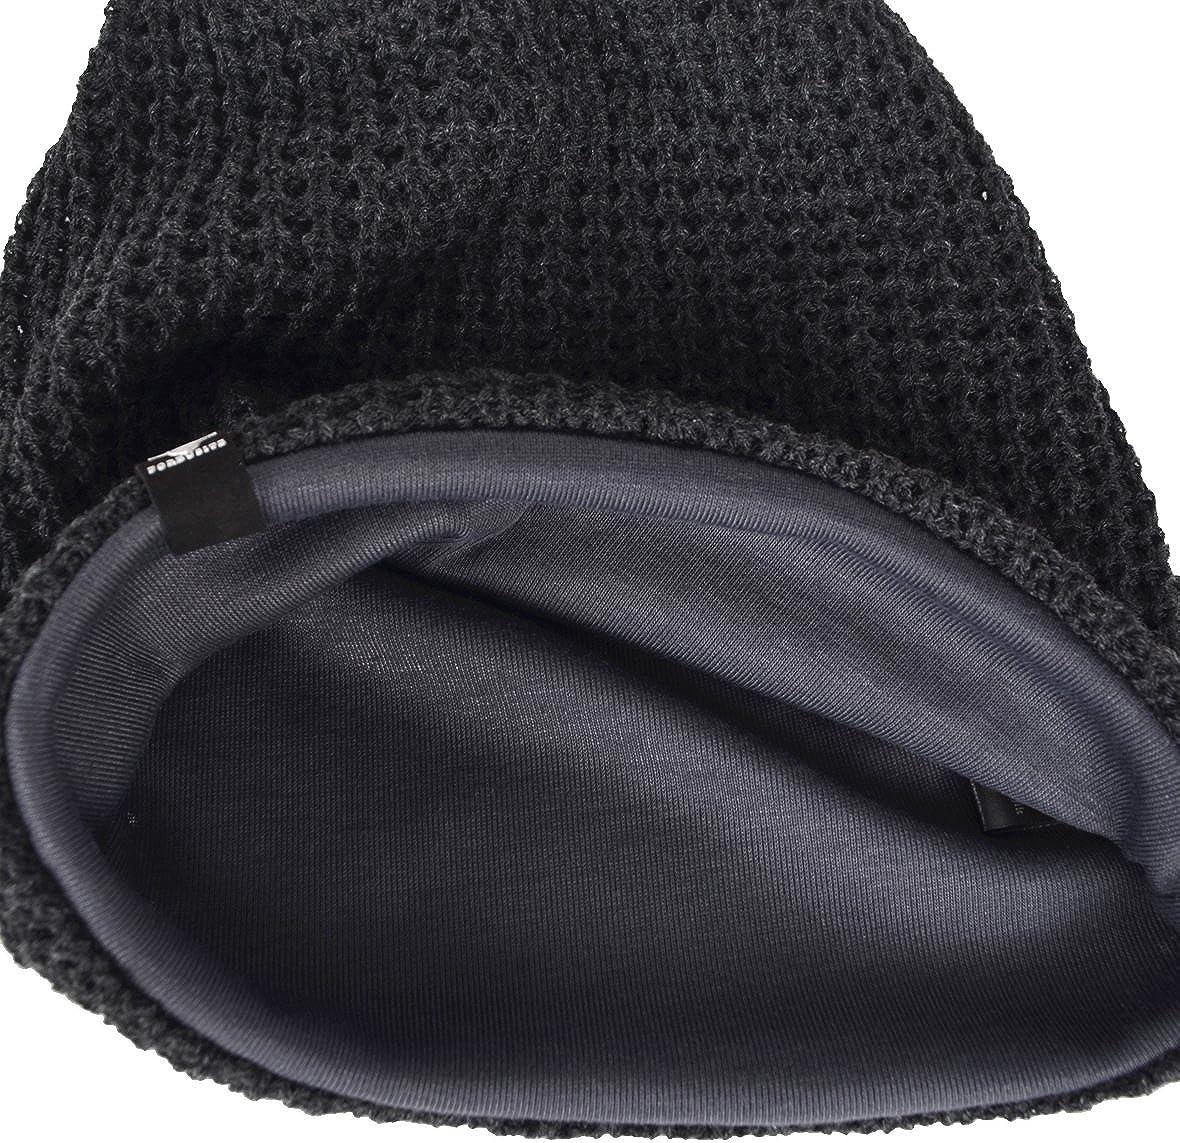 HISSHE Women Slouch Beanie Knitted Beret Skullcap Baggy Winter Summer Hats CB08w